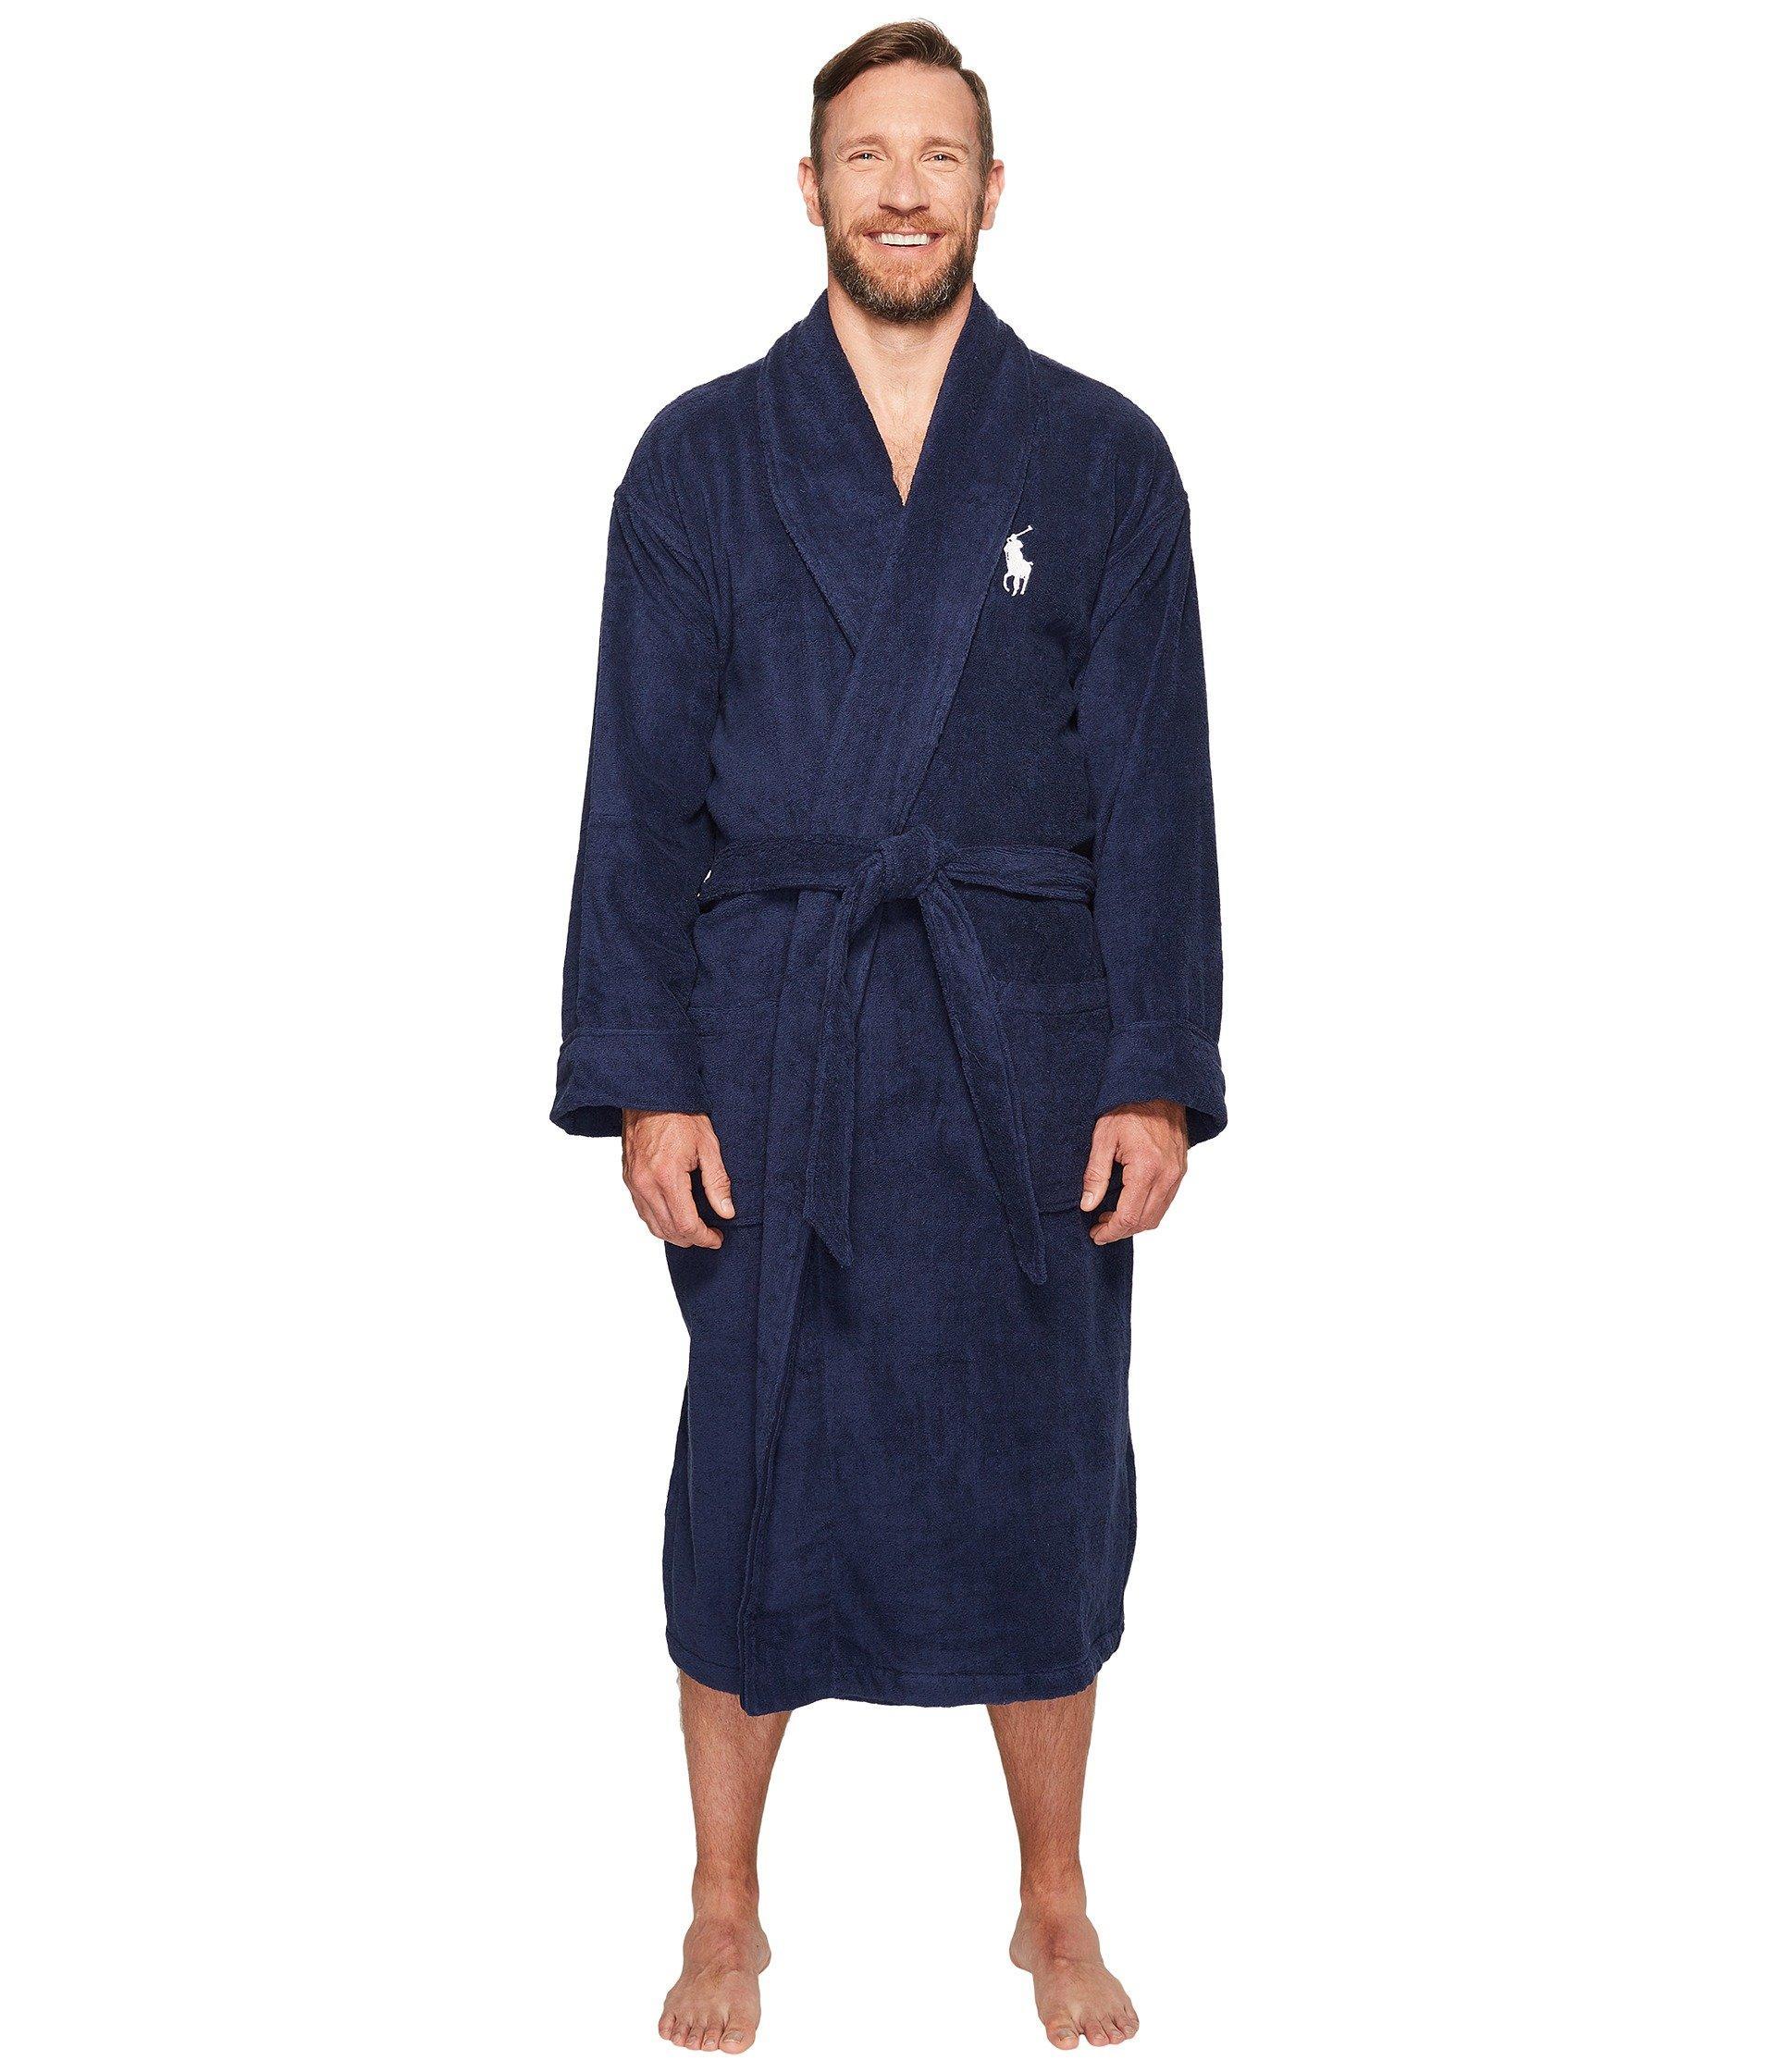 Polo ralph lauren Mens Kimono Cotton Velour Robe in Blue